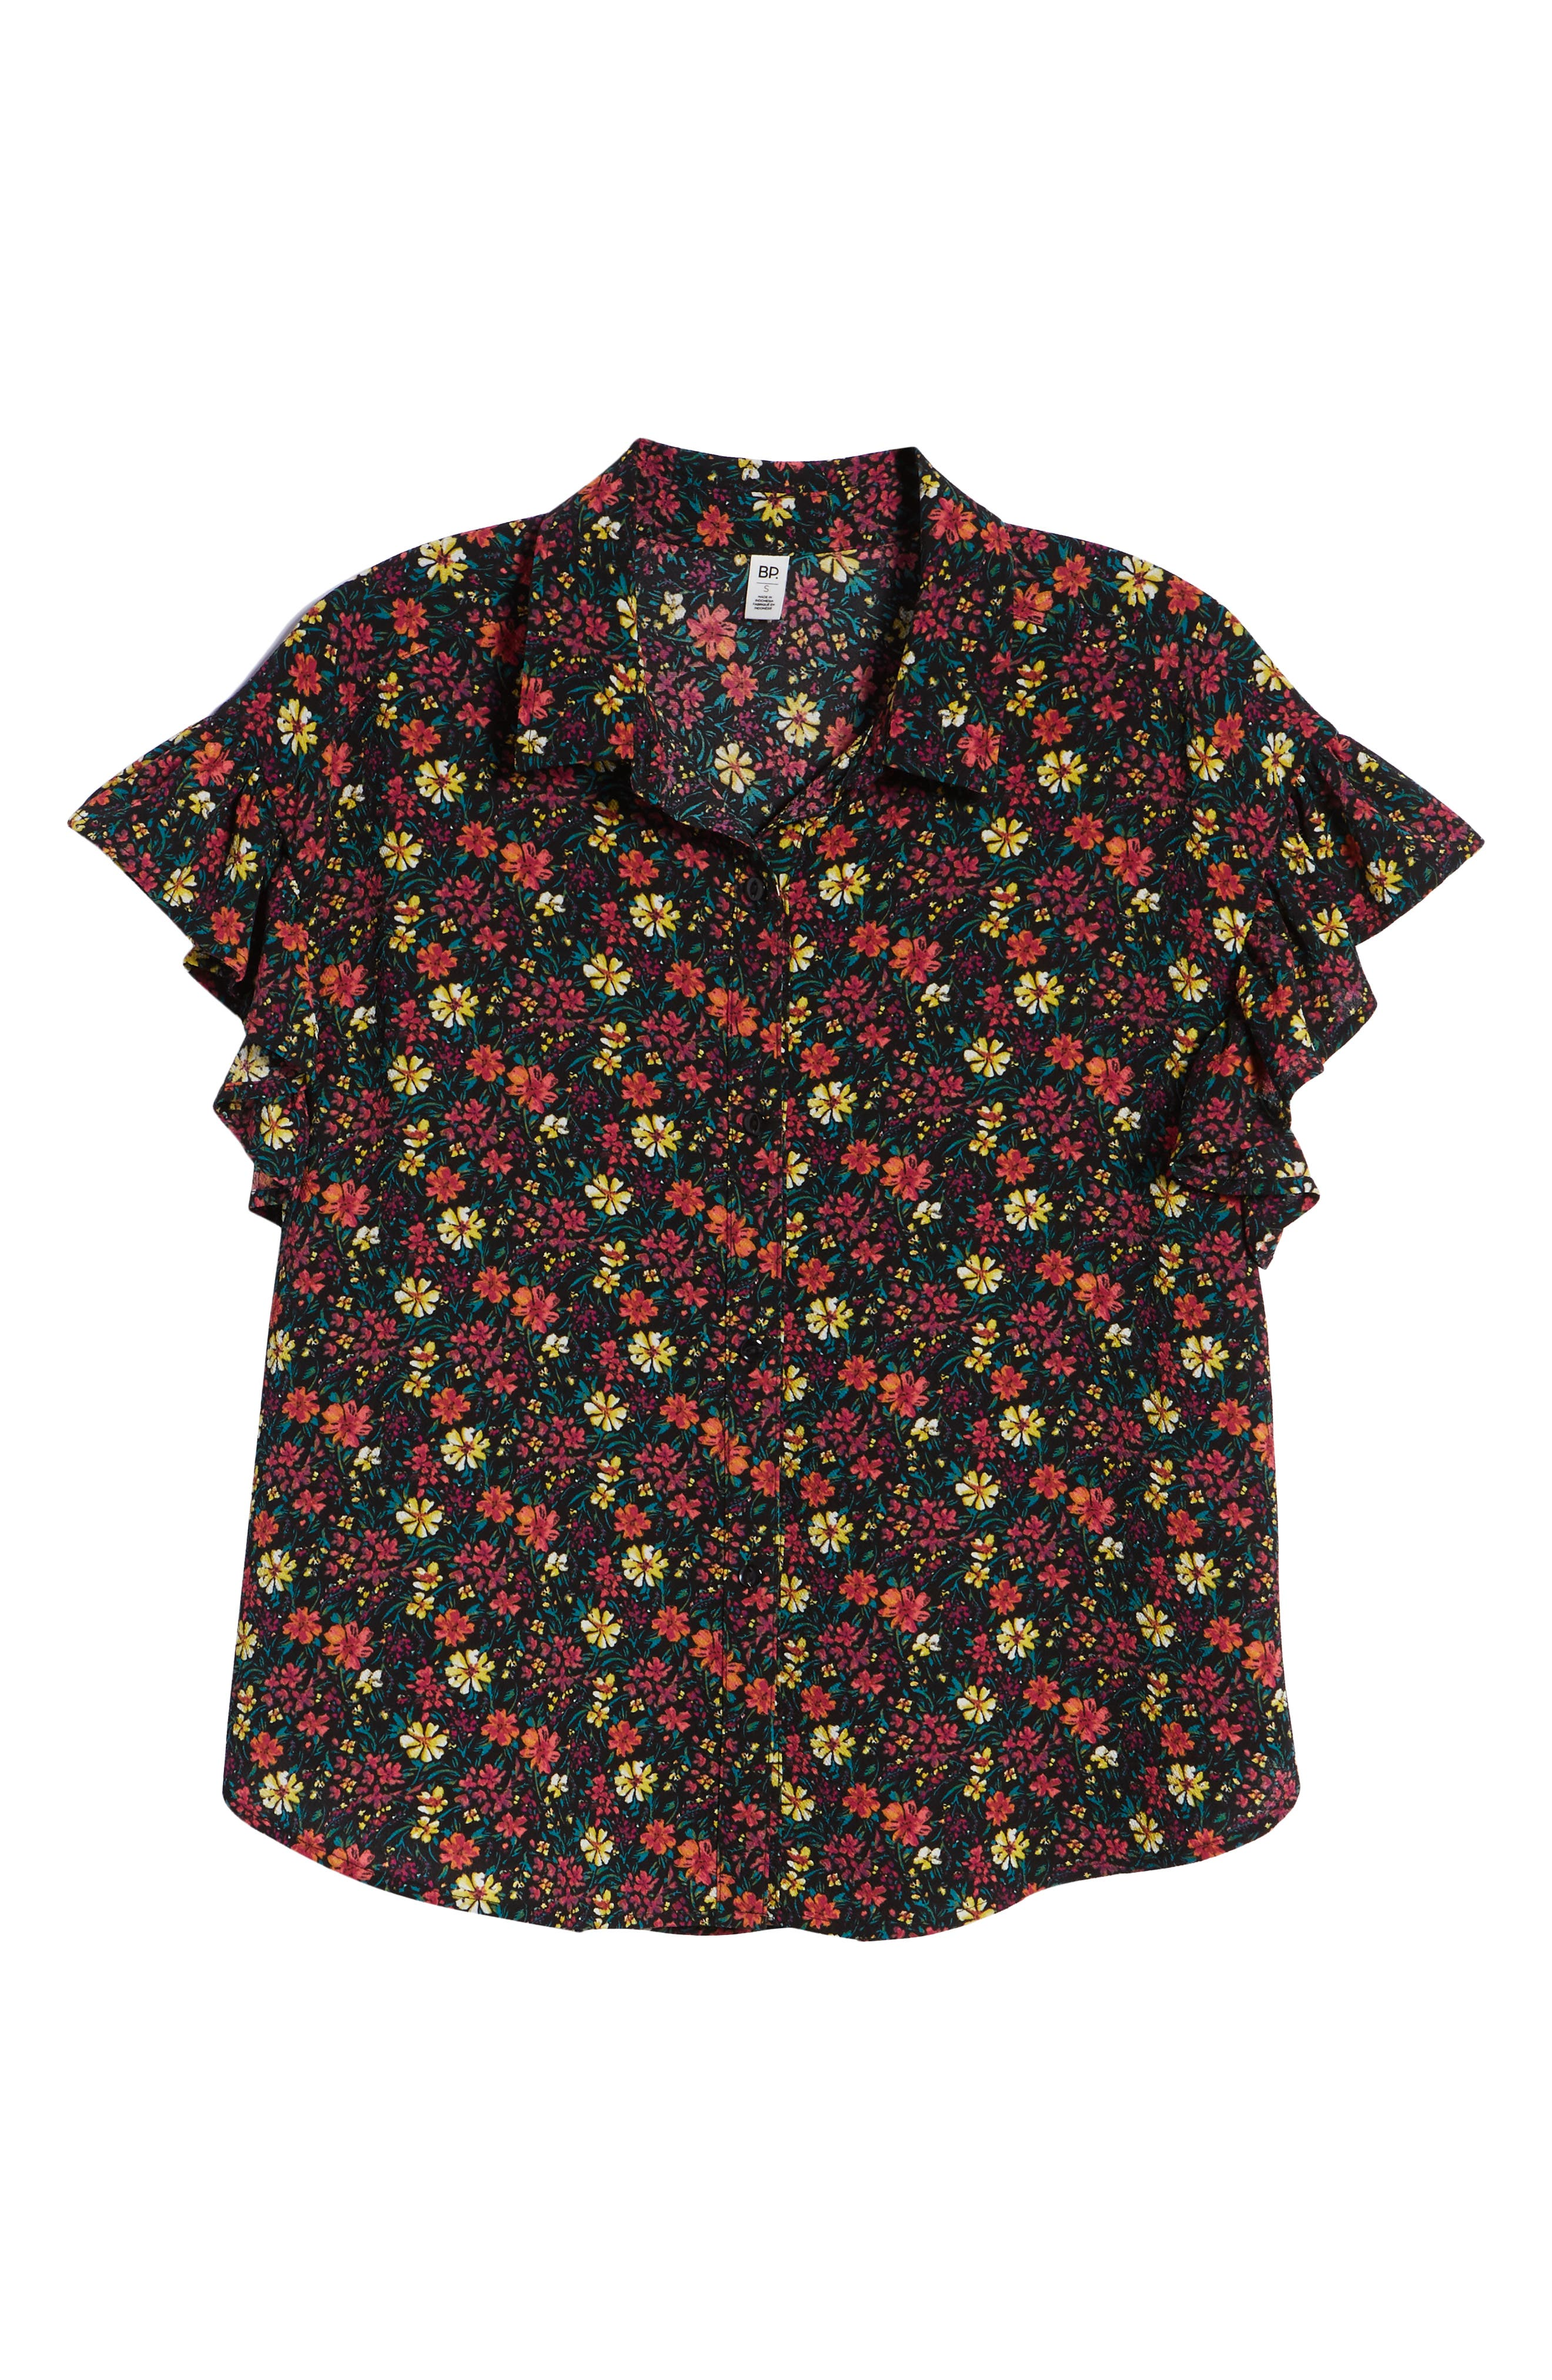 Ruffle Sleeve Print Shirt,                             Alternate thumbnail 7, color,                             BLACK MIX N MATCH A